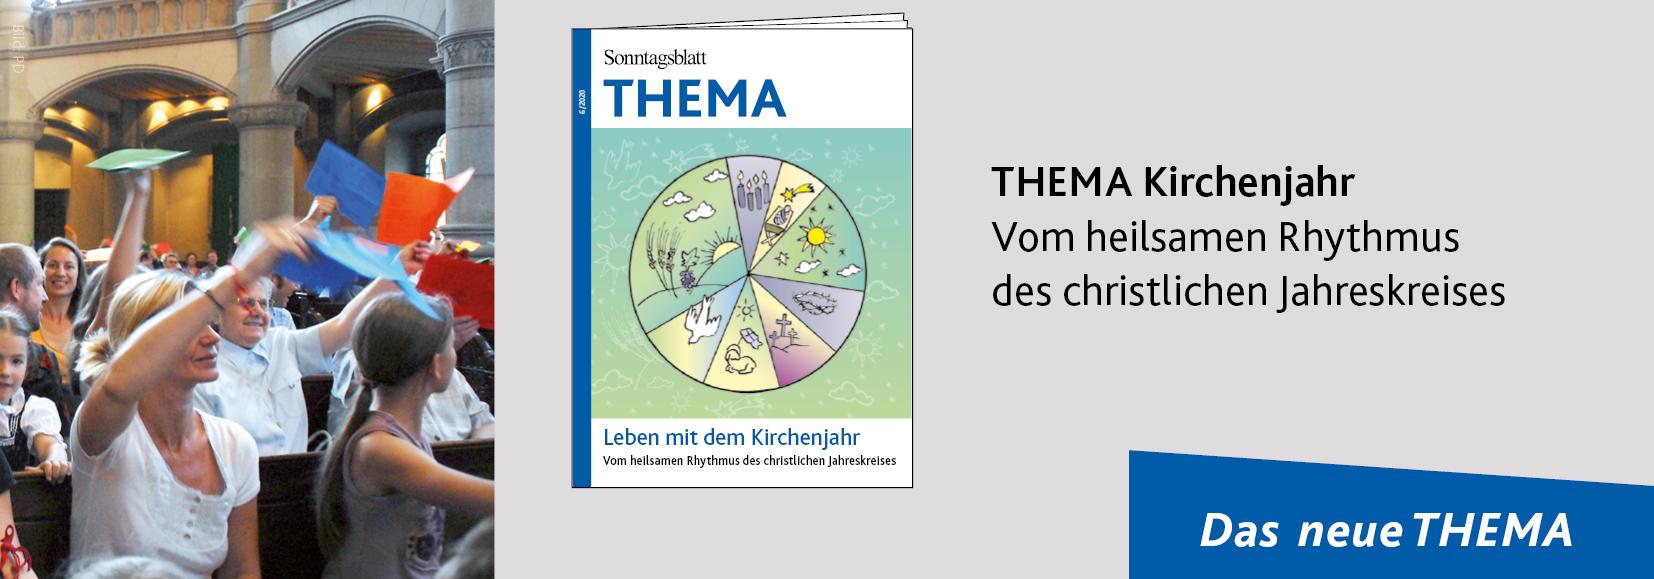 Sonntagsblatt THEMA Kirchenjahr